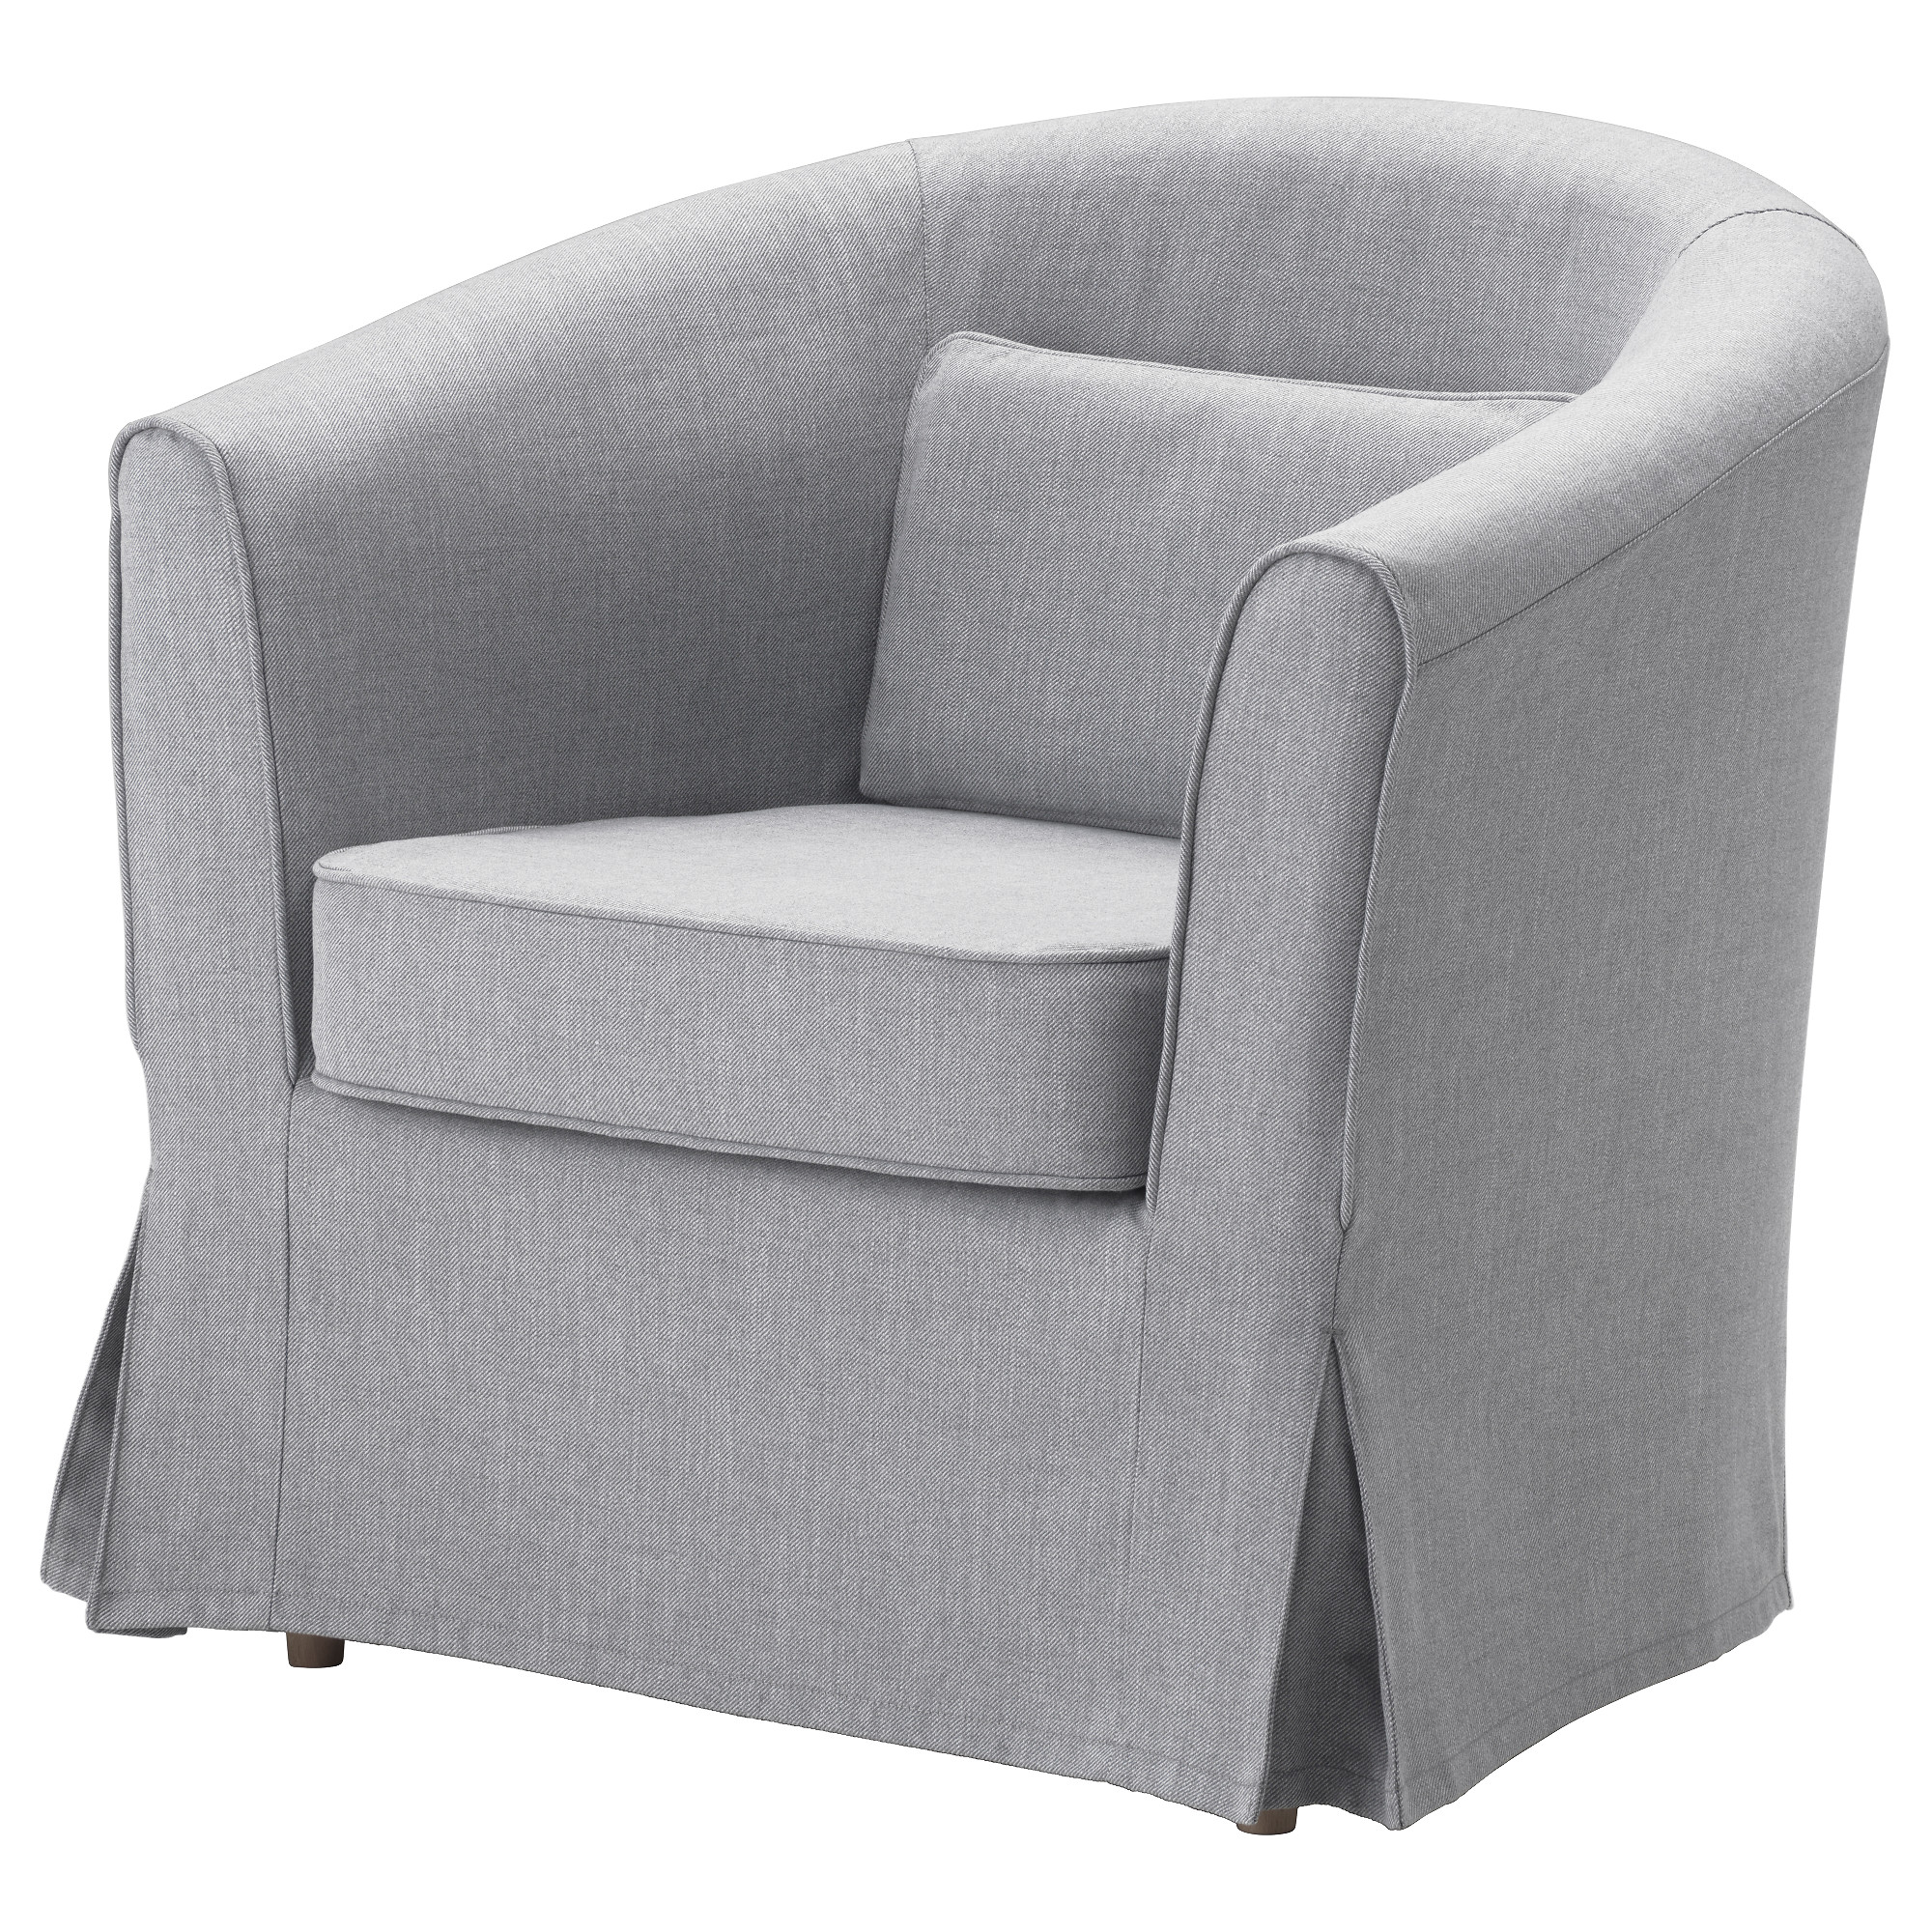 Recliner Chair Covers Grey Modern Design Living Room Ikea Tullsta Armchair Cover Nordvalla Medium Gray Baby Things